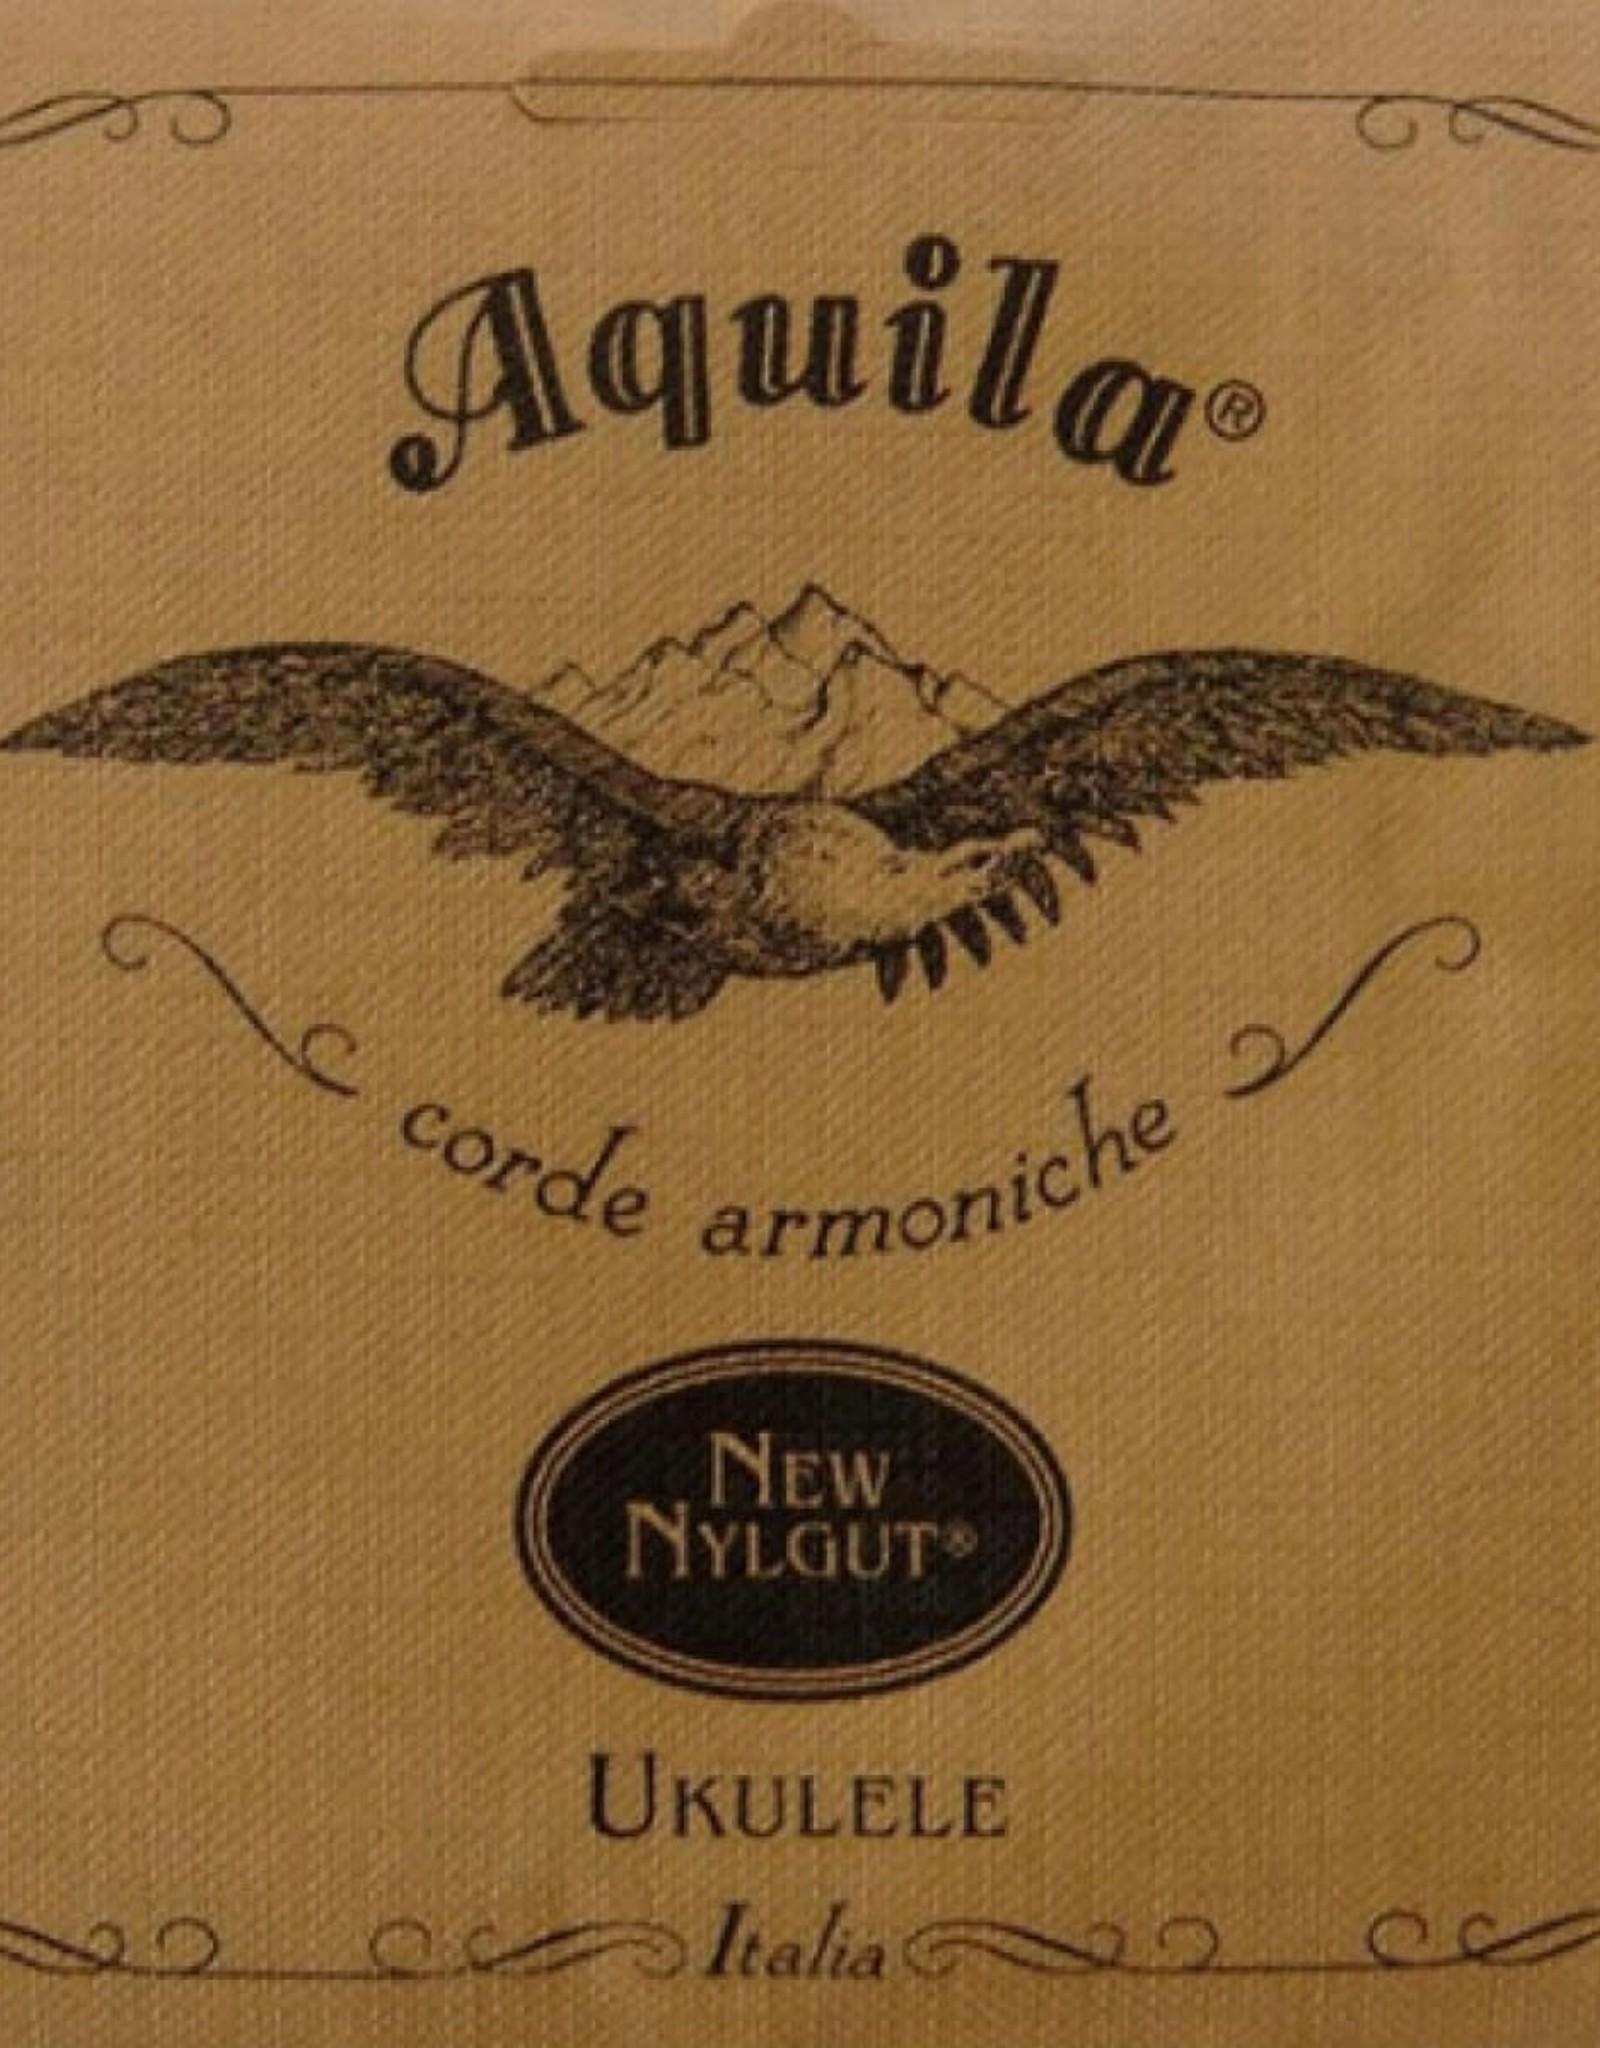 AQUILA new nylgut 91